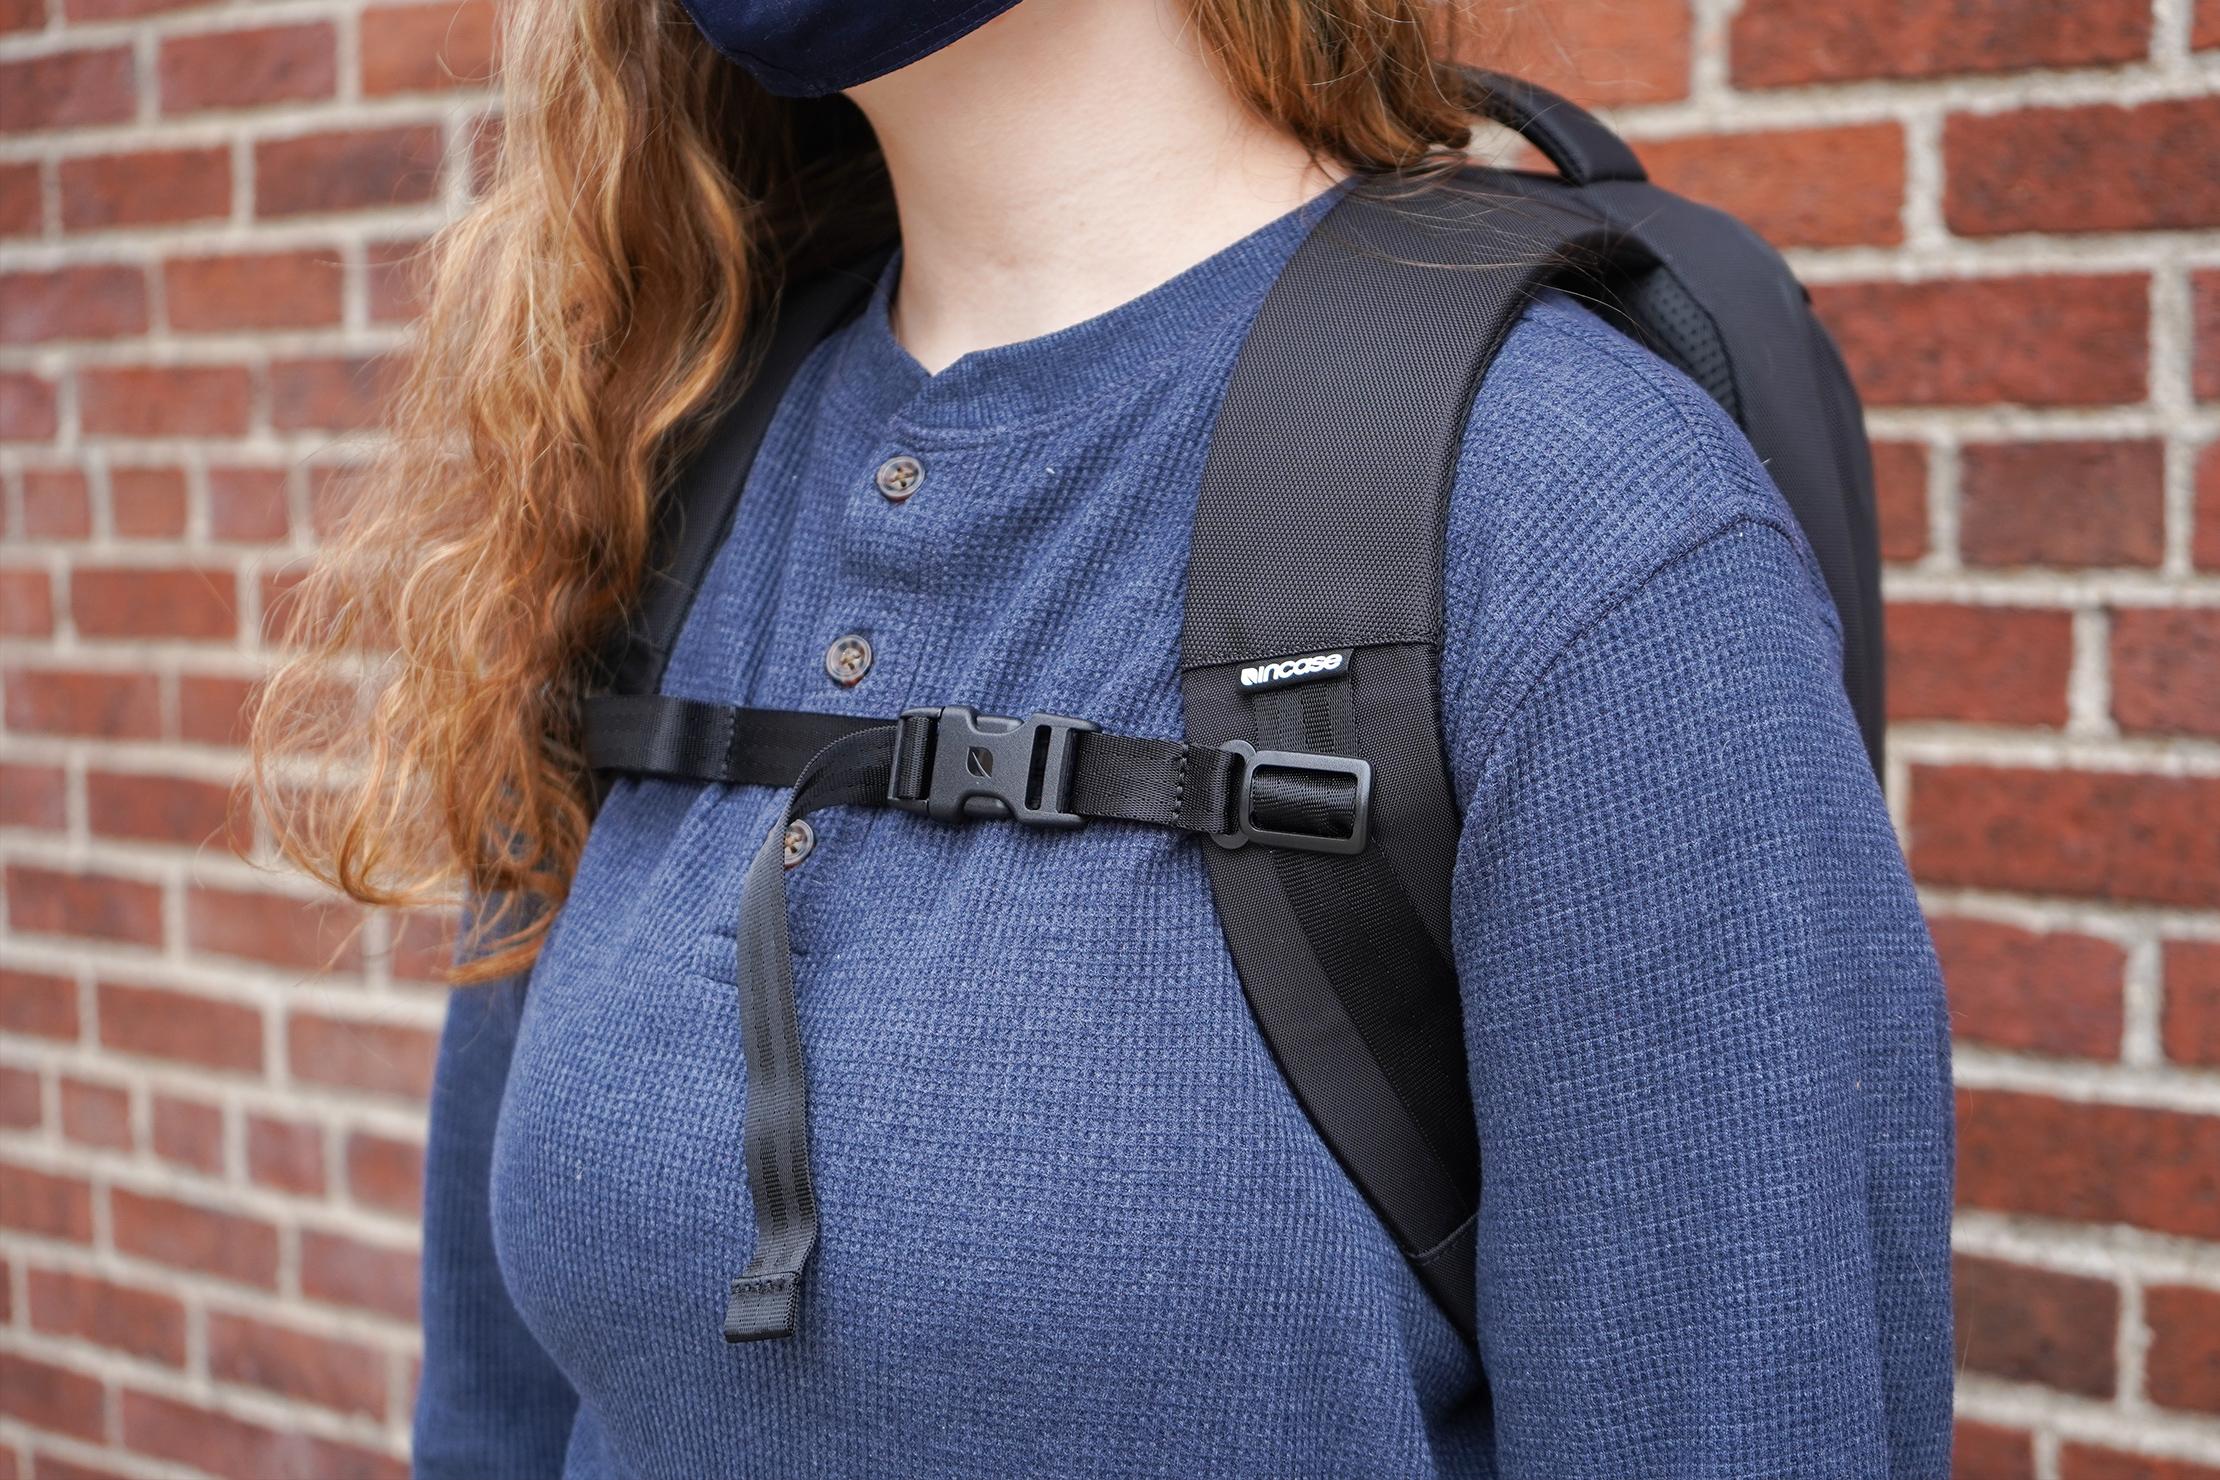 Incase ICON Lite Triple Black Backpack Shoulder Straps and Sternum Strap